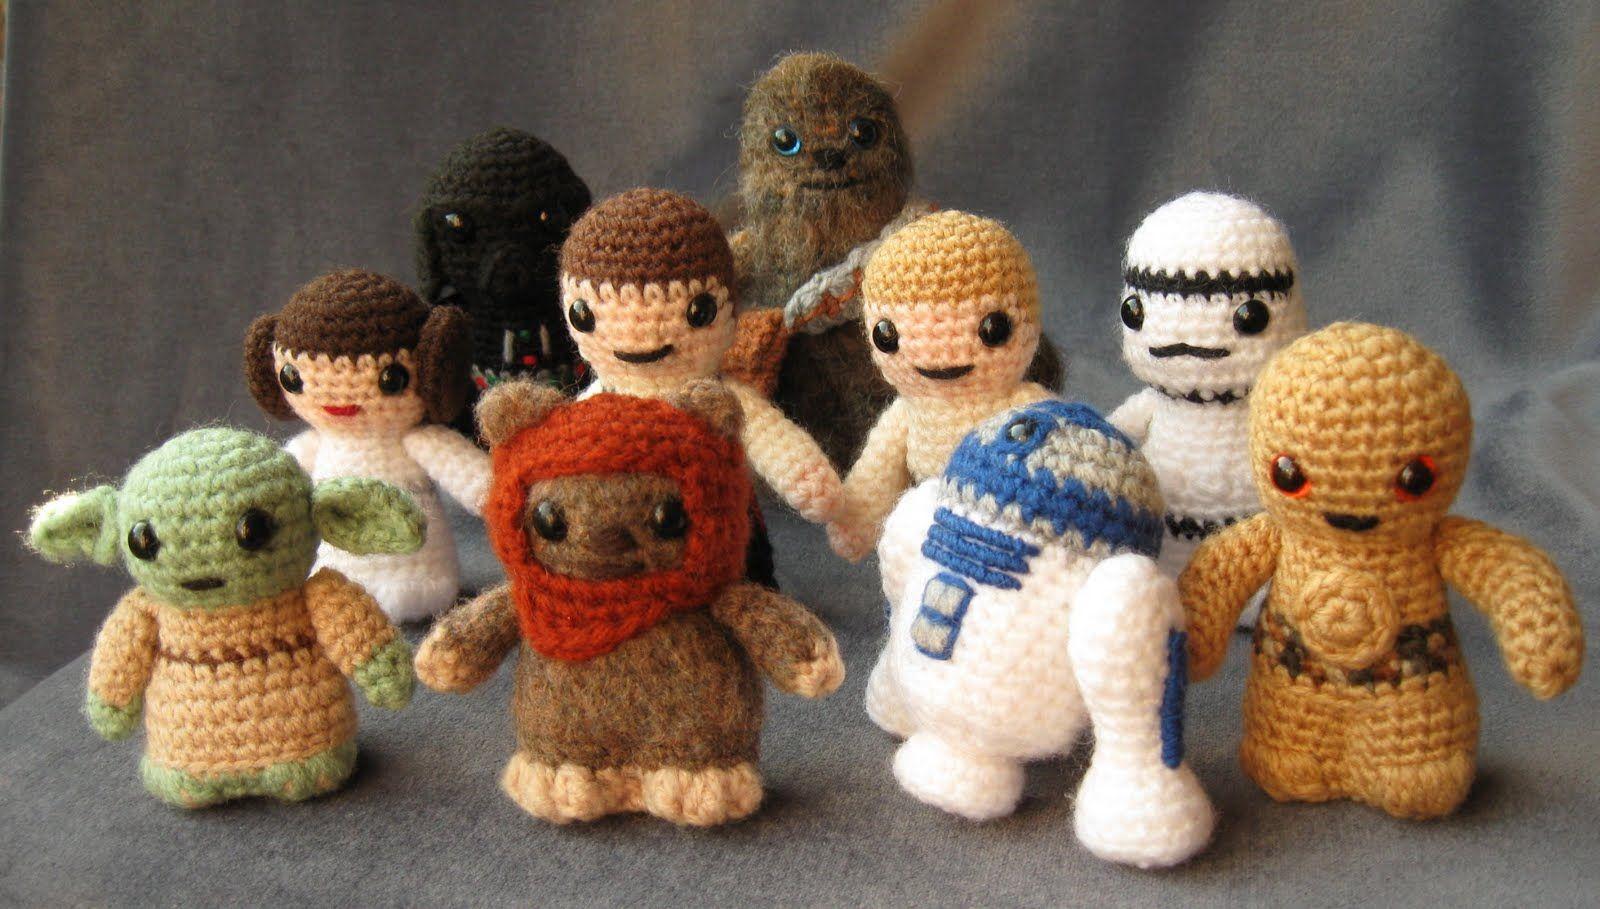 Cute Amigurumi Knitting Patterns : Crochet your own action figures amigurumi crochet and yarns